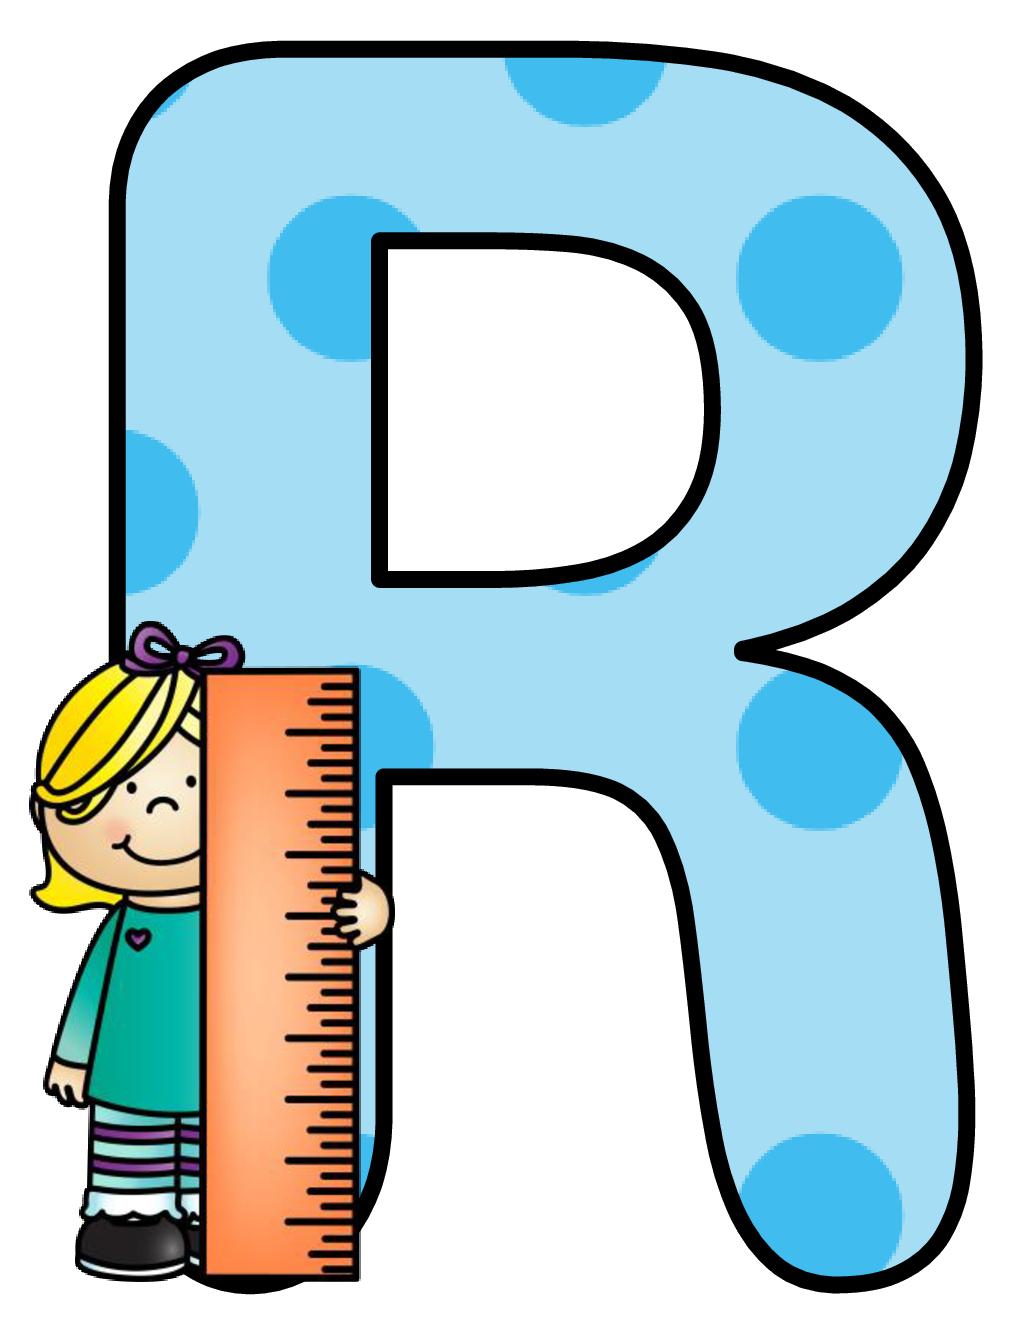 Ch b alfabeto escolar. Numbers clipart calligraphy